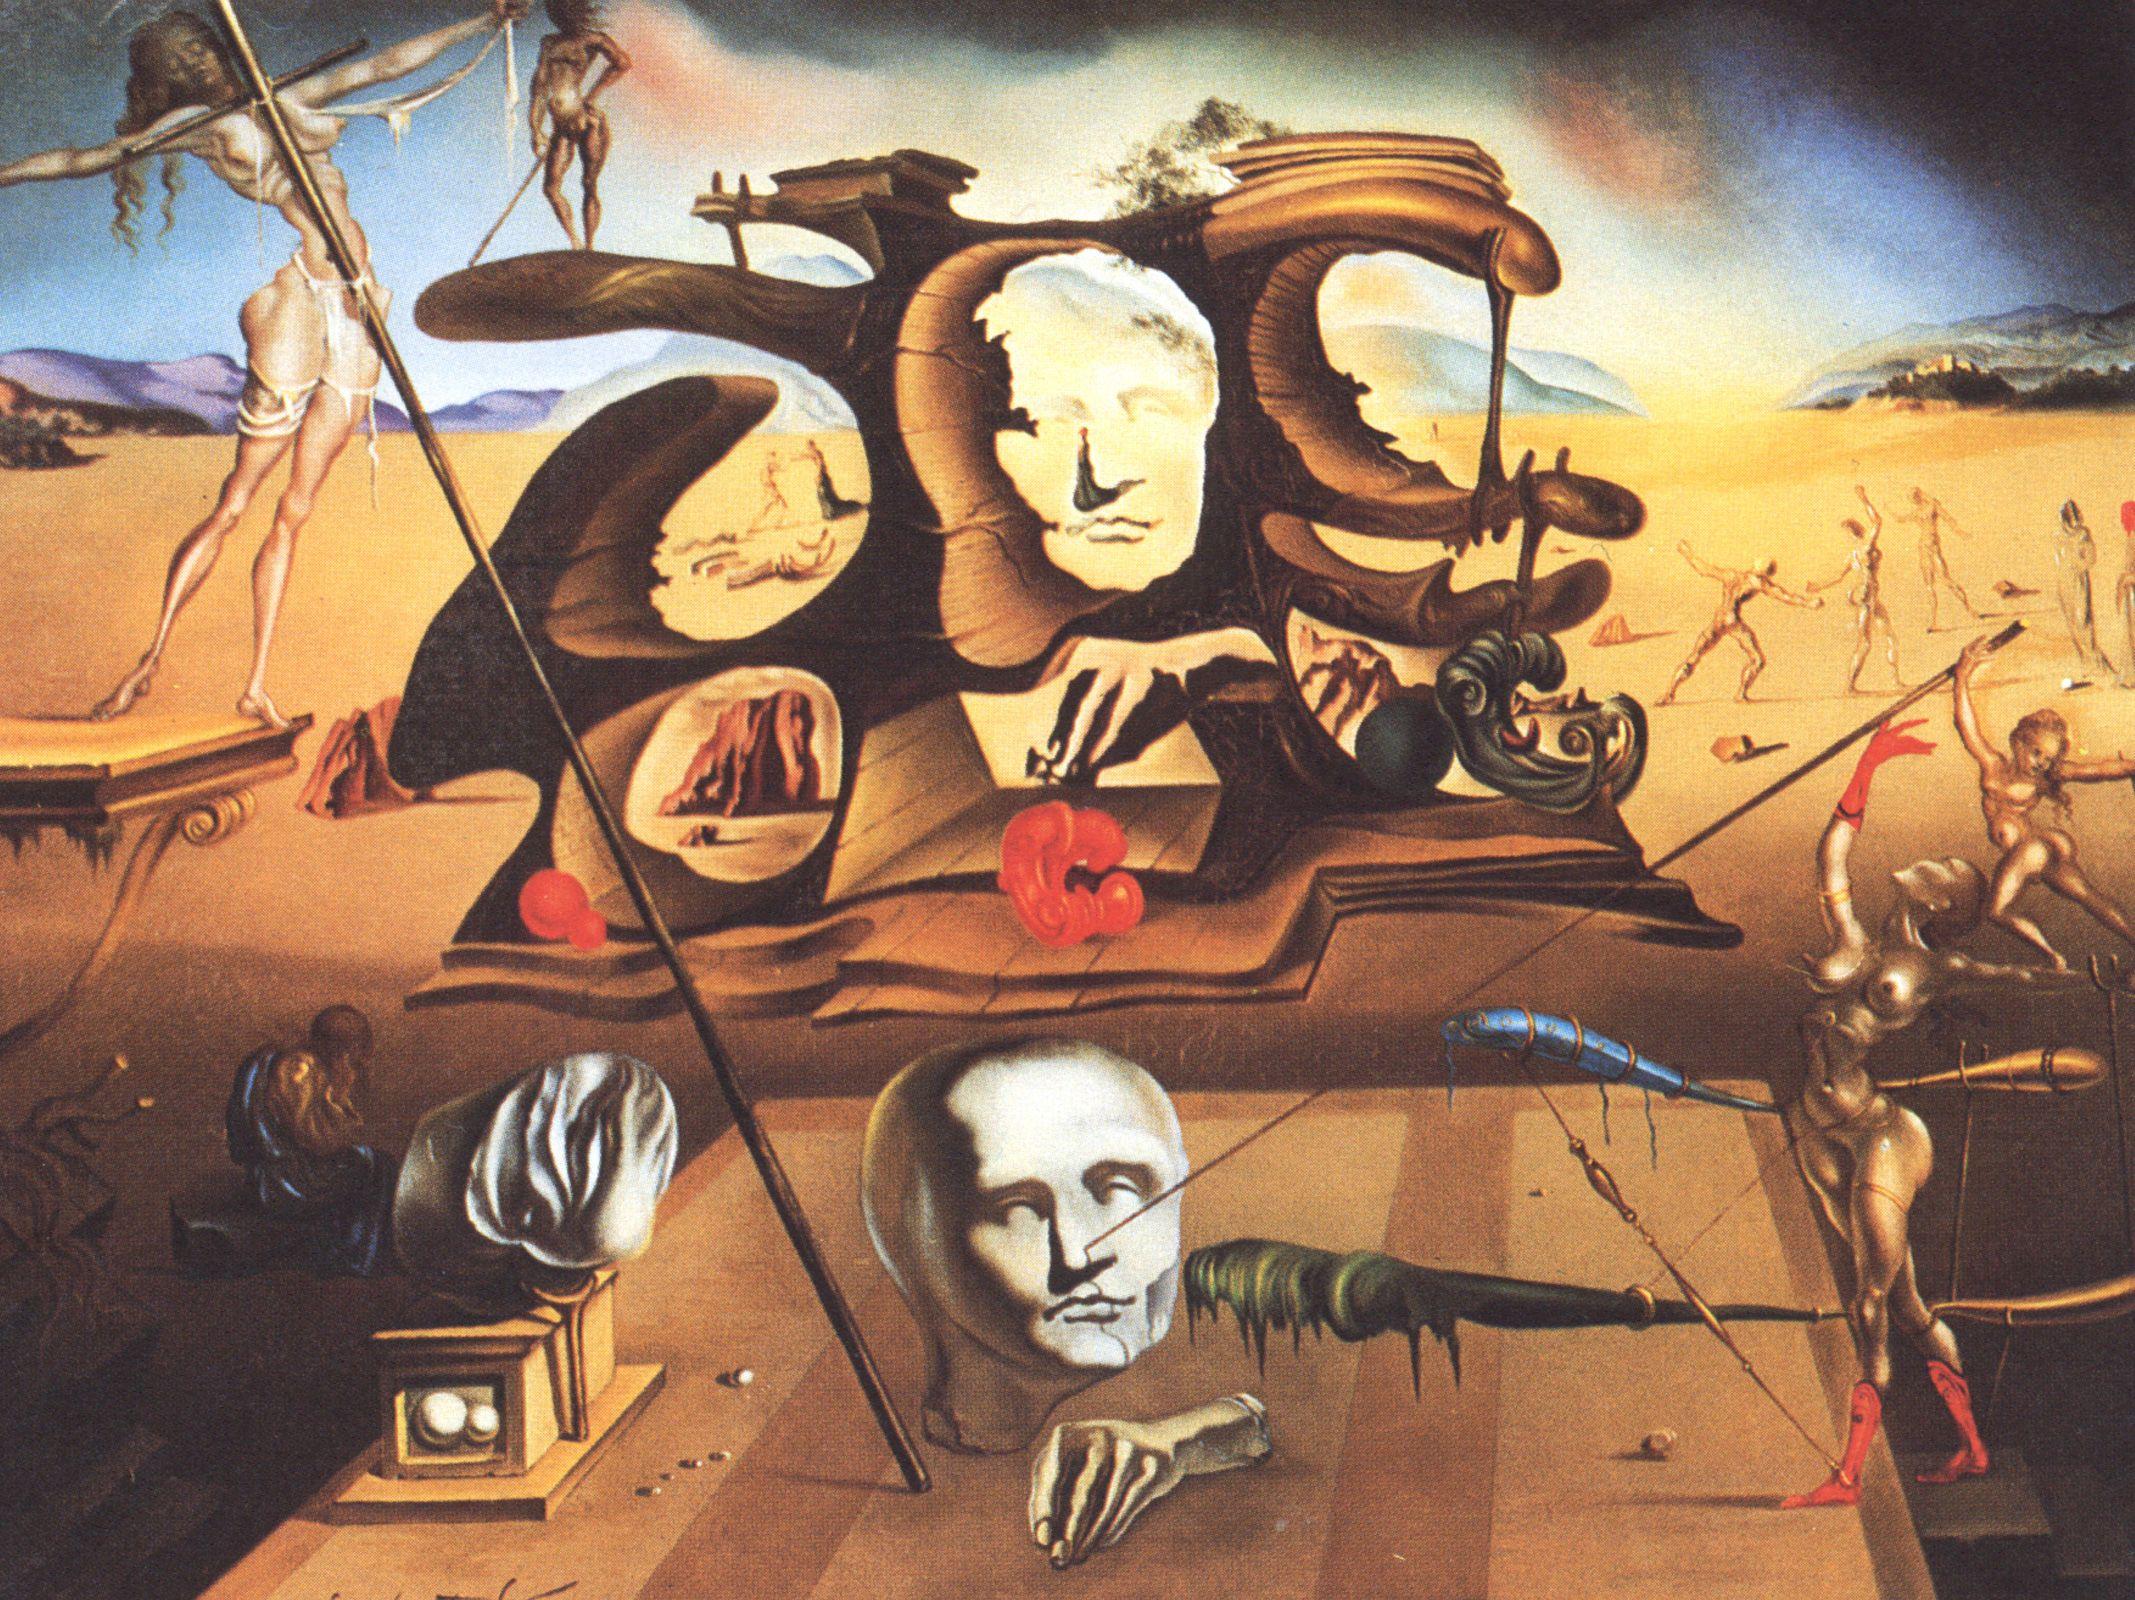 Salvador Dali, art, painting, surrealism, 1940s, 1945 ...